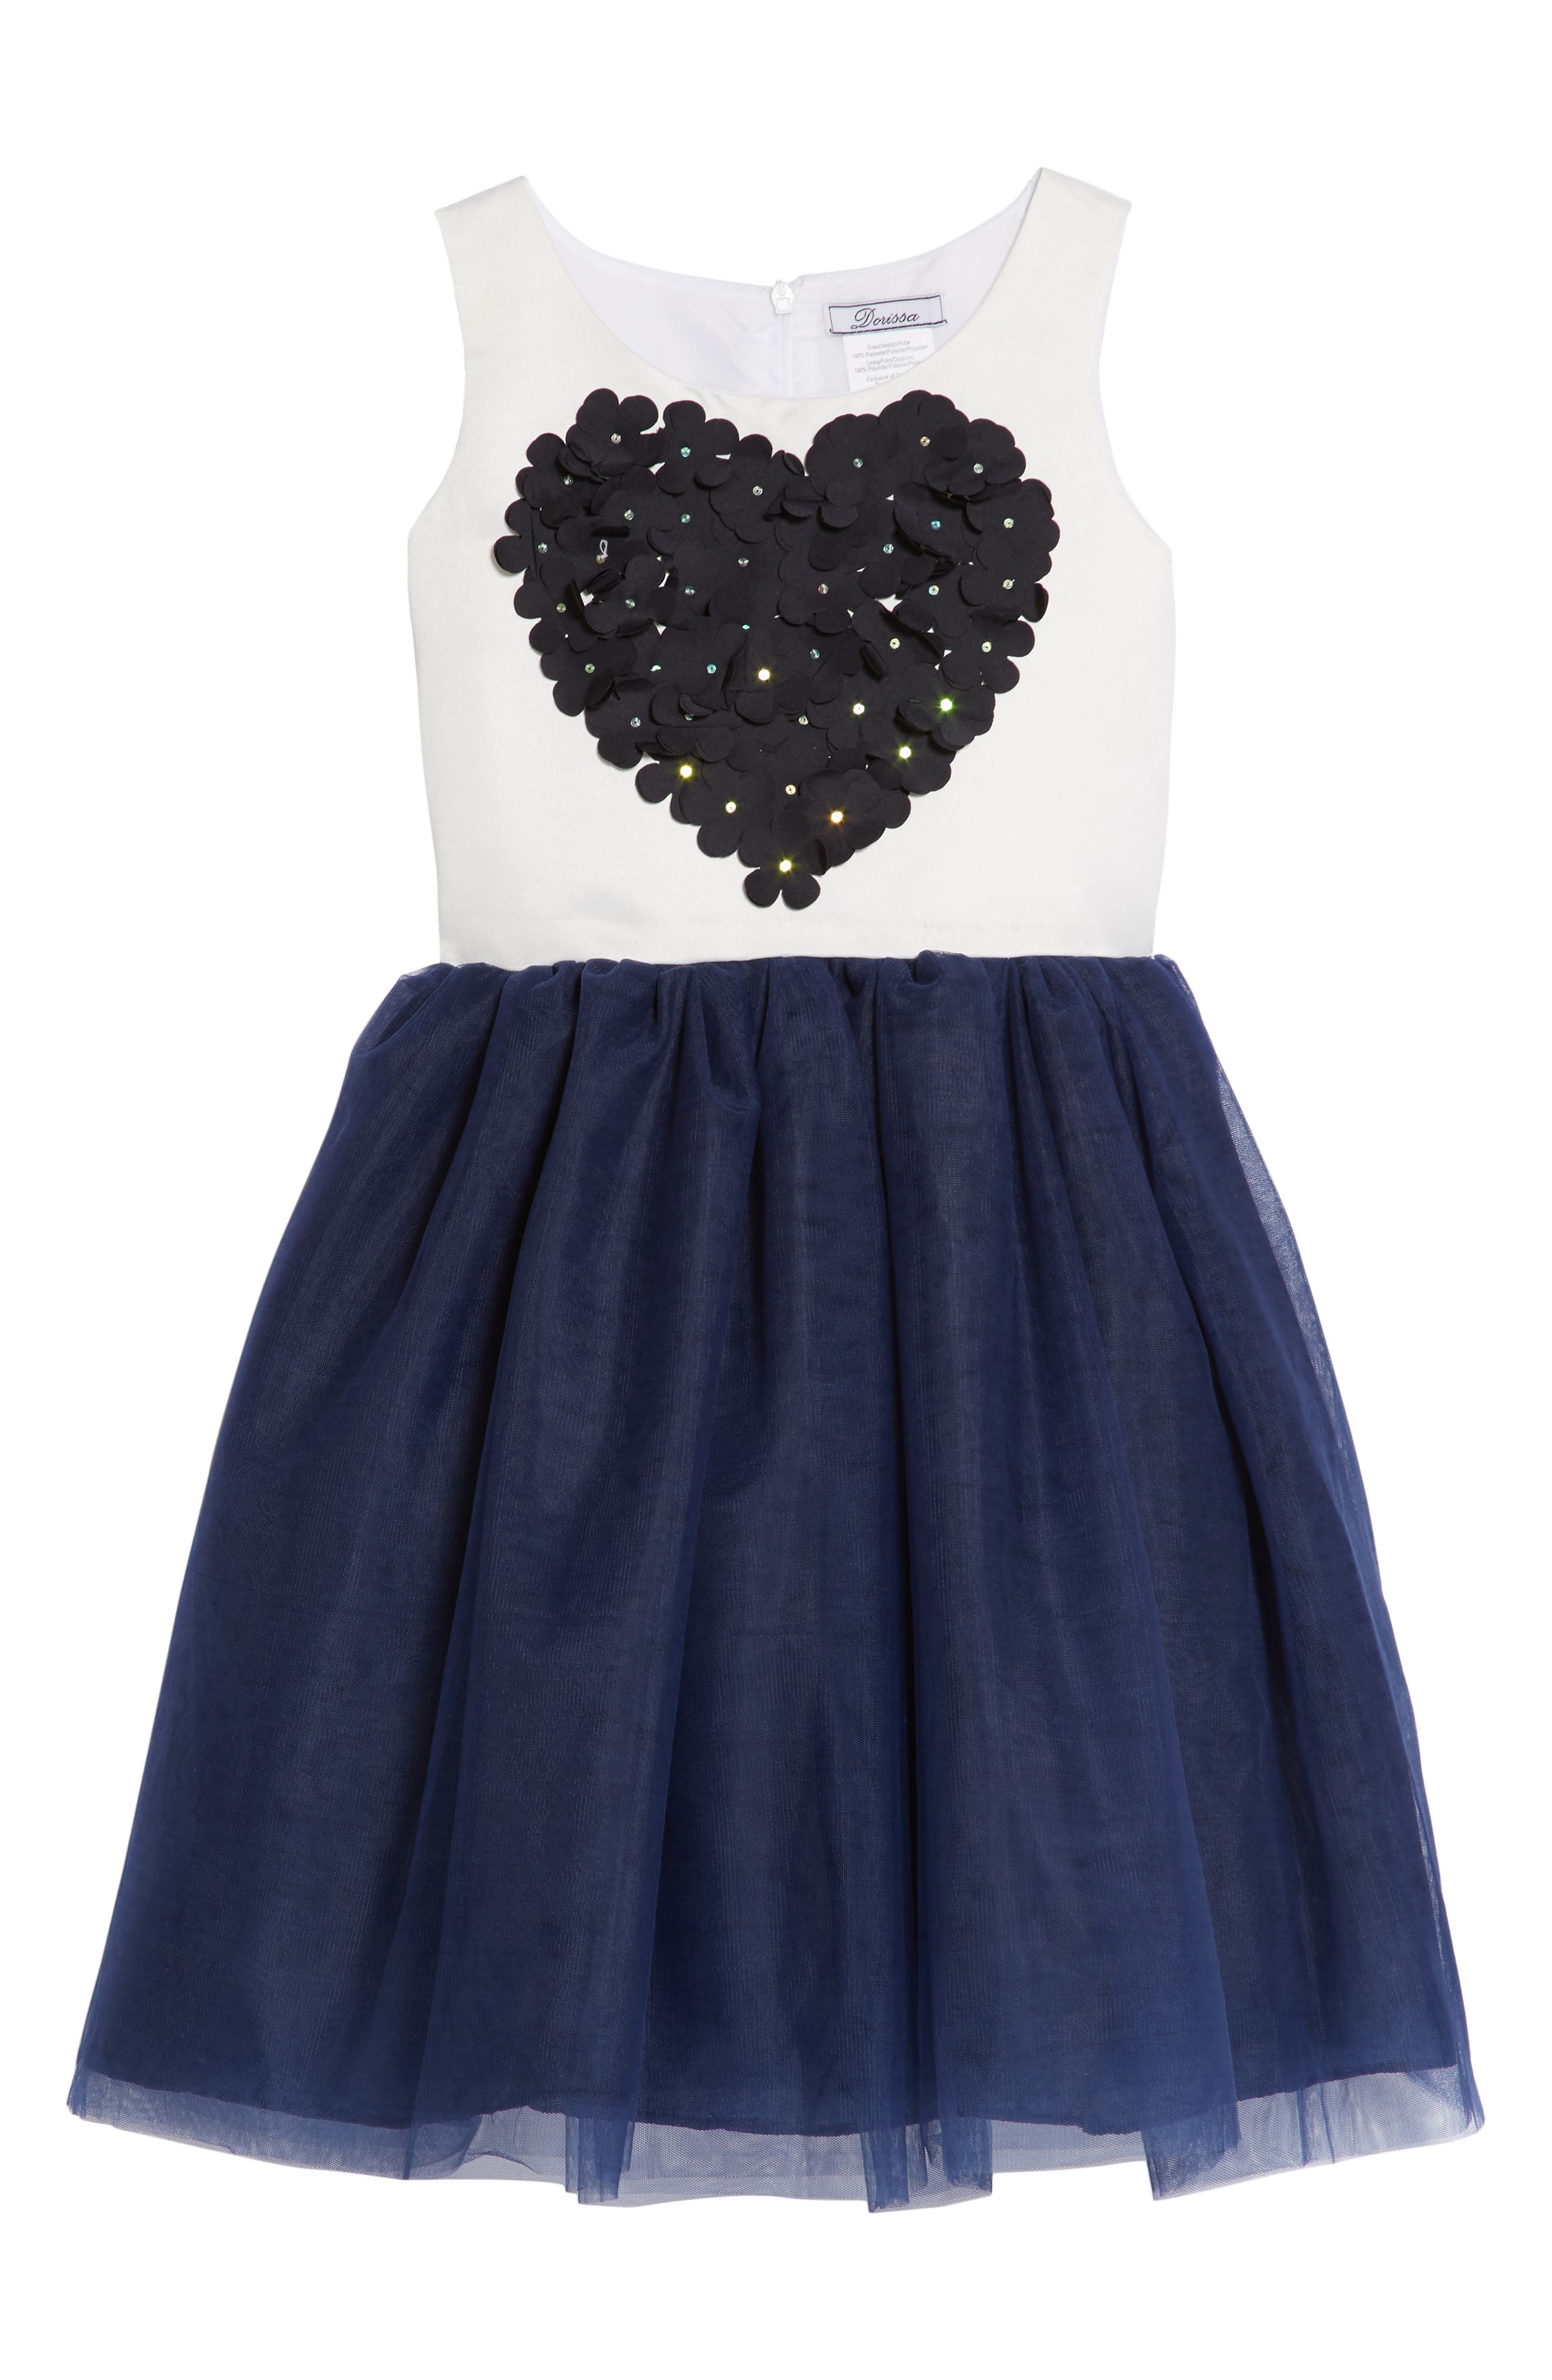 Dorissa Amy Flower Embellished Tulle Dress (Toddler Girls, Little Girls & Big Girls)